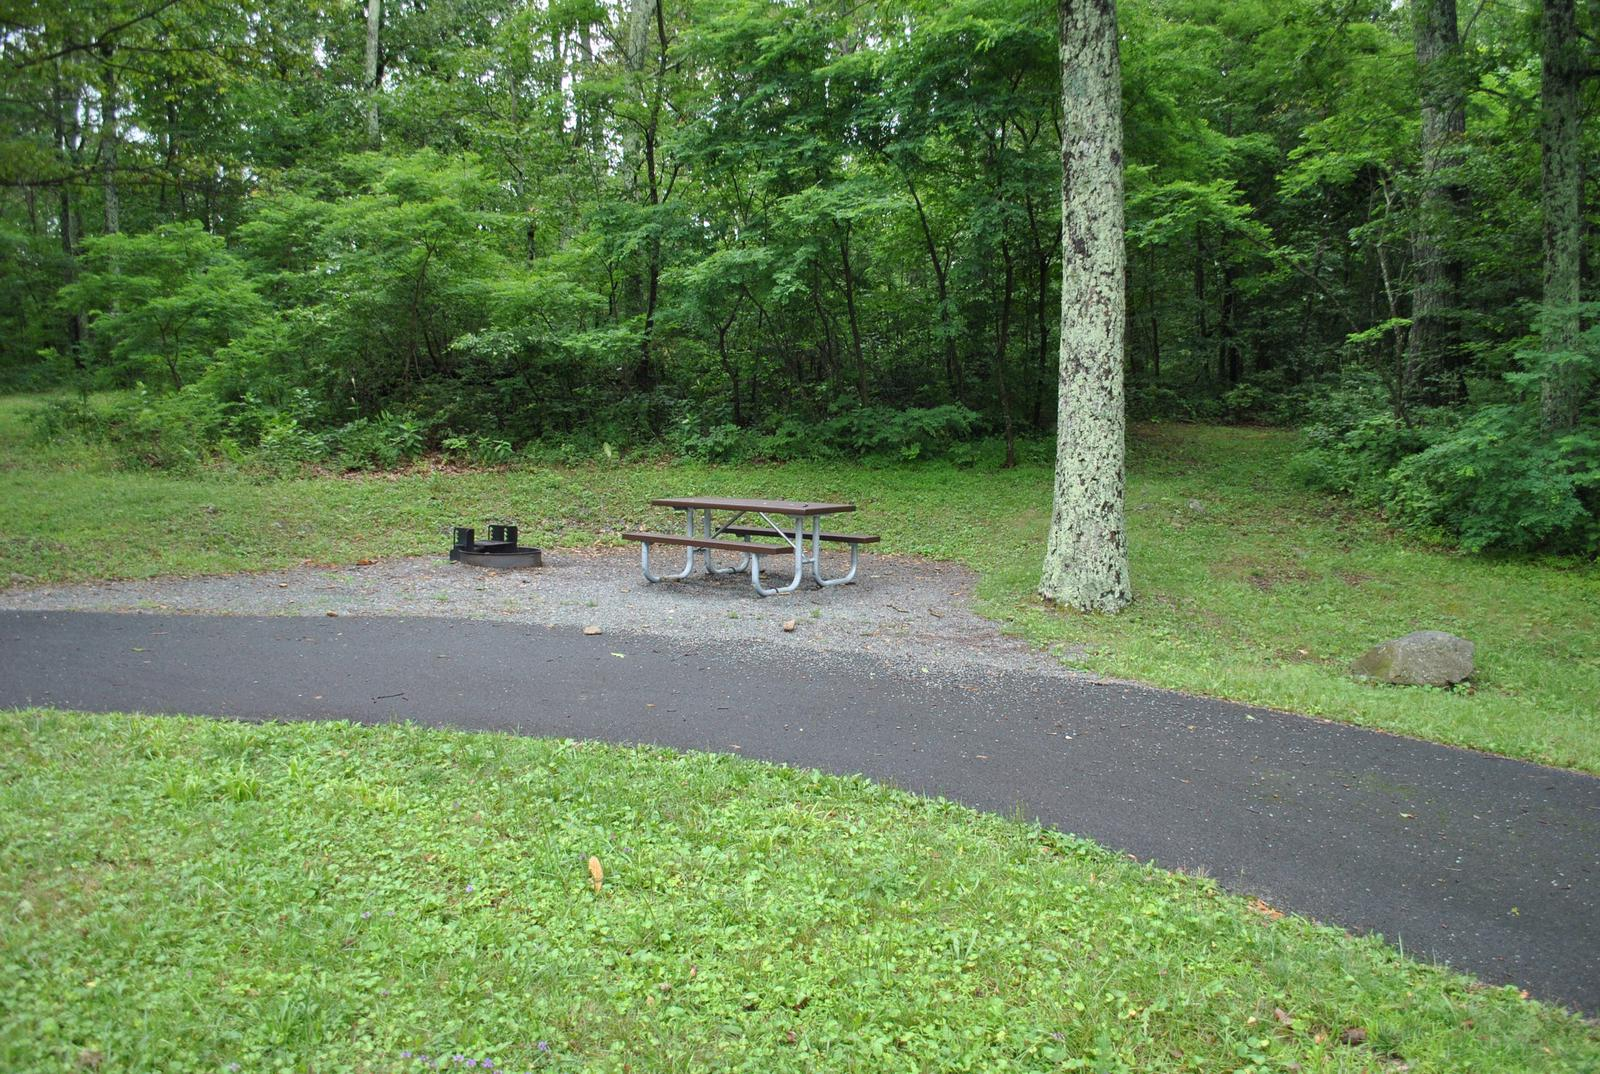 Mathews Arm Campground – Site A043